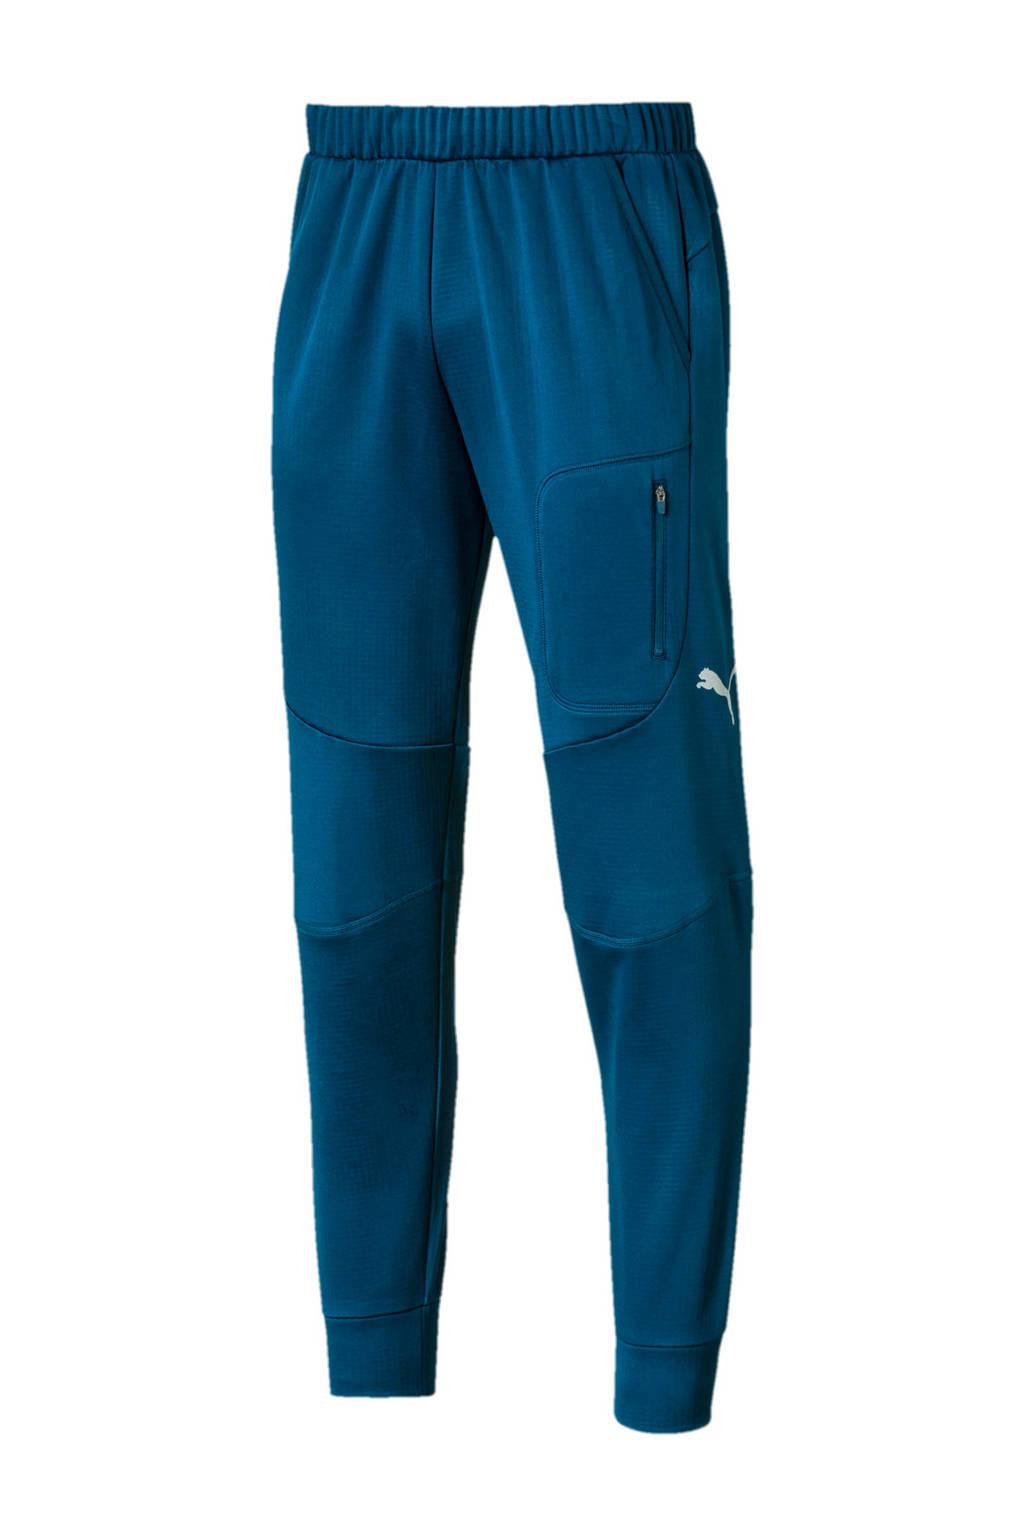 Puma   trainingsbroek donkerblauw, Donkerblauw